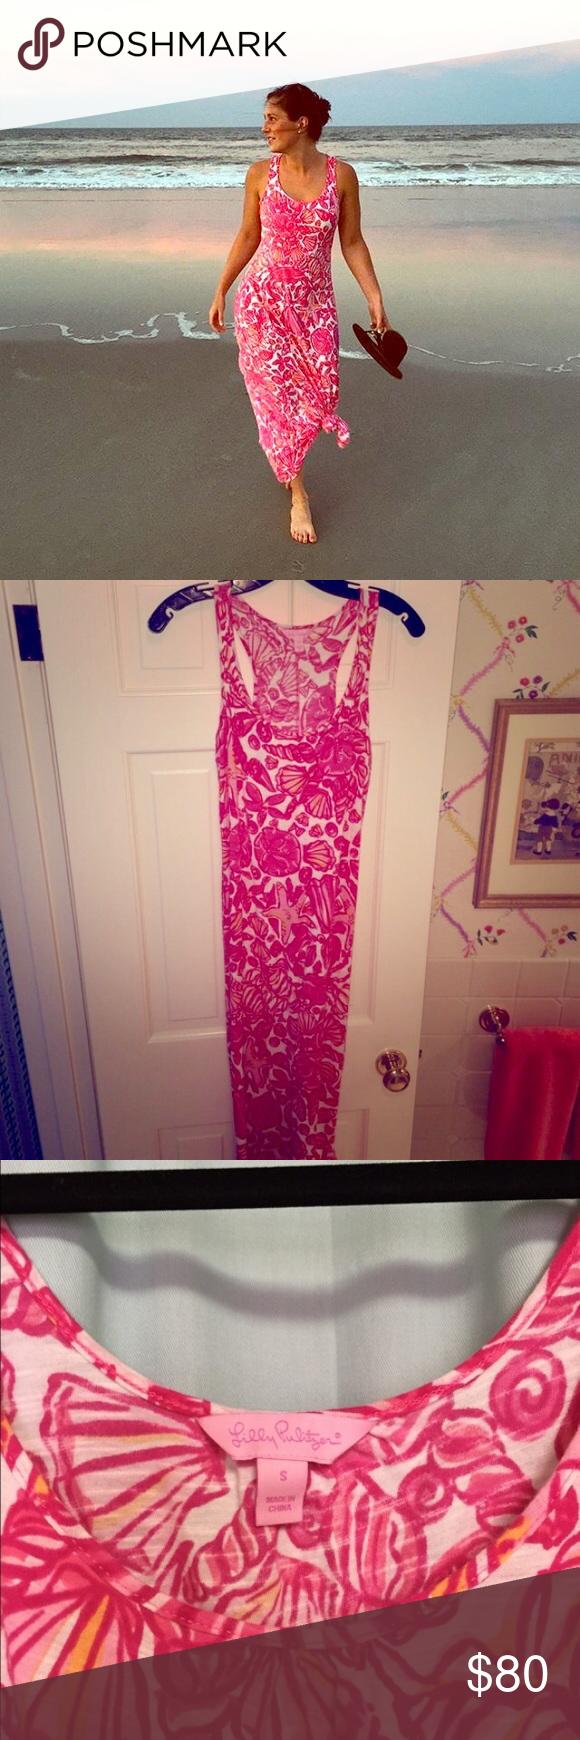 Lilly Pulitzer Maxi Dress - Small